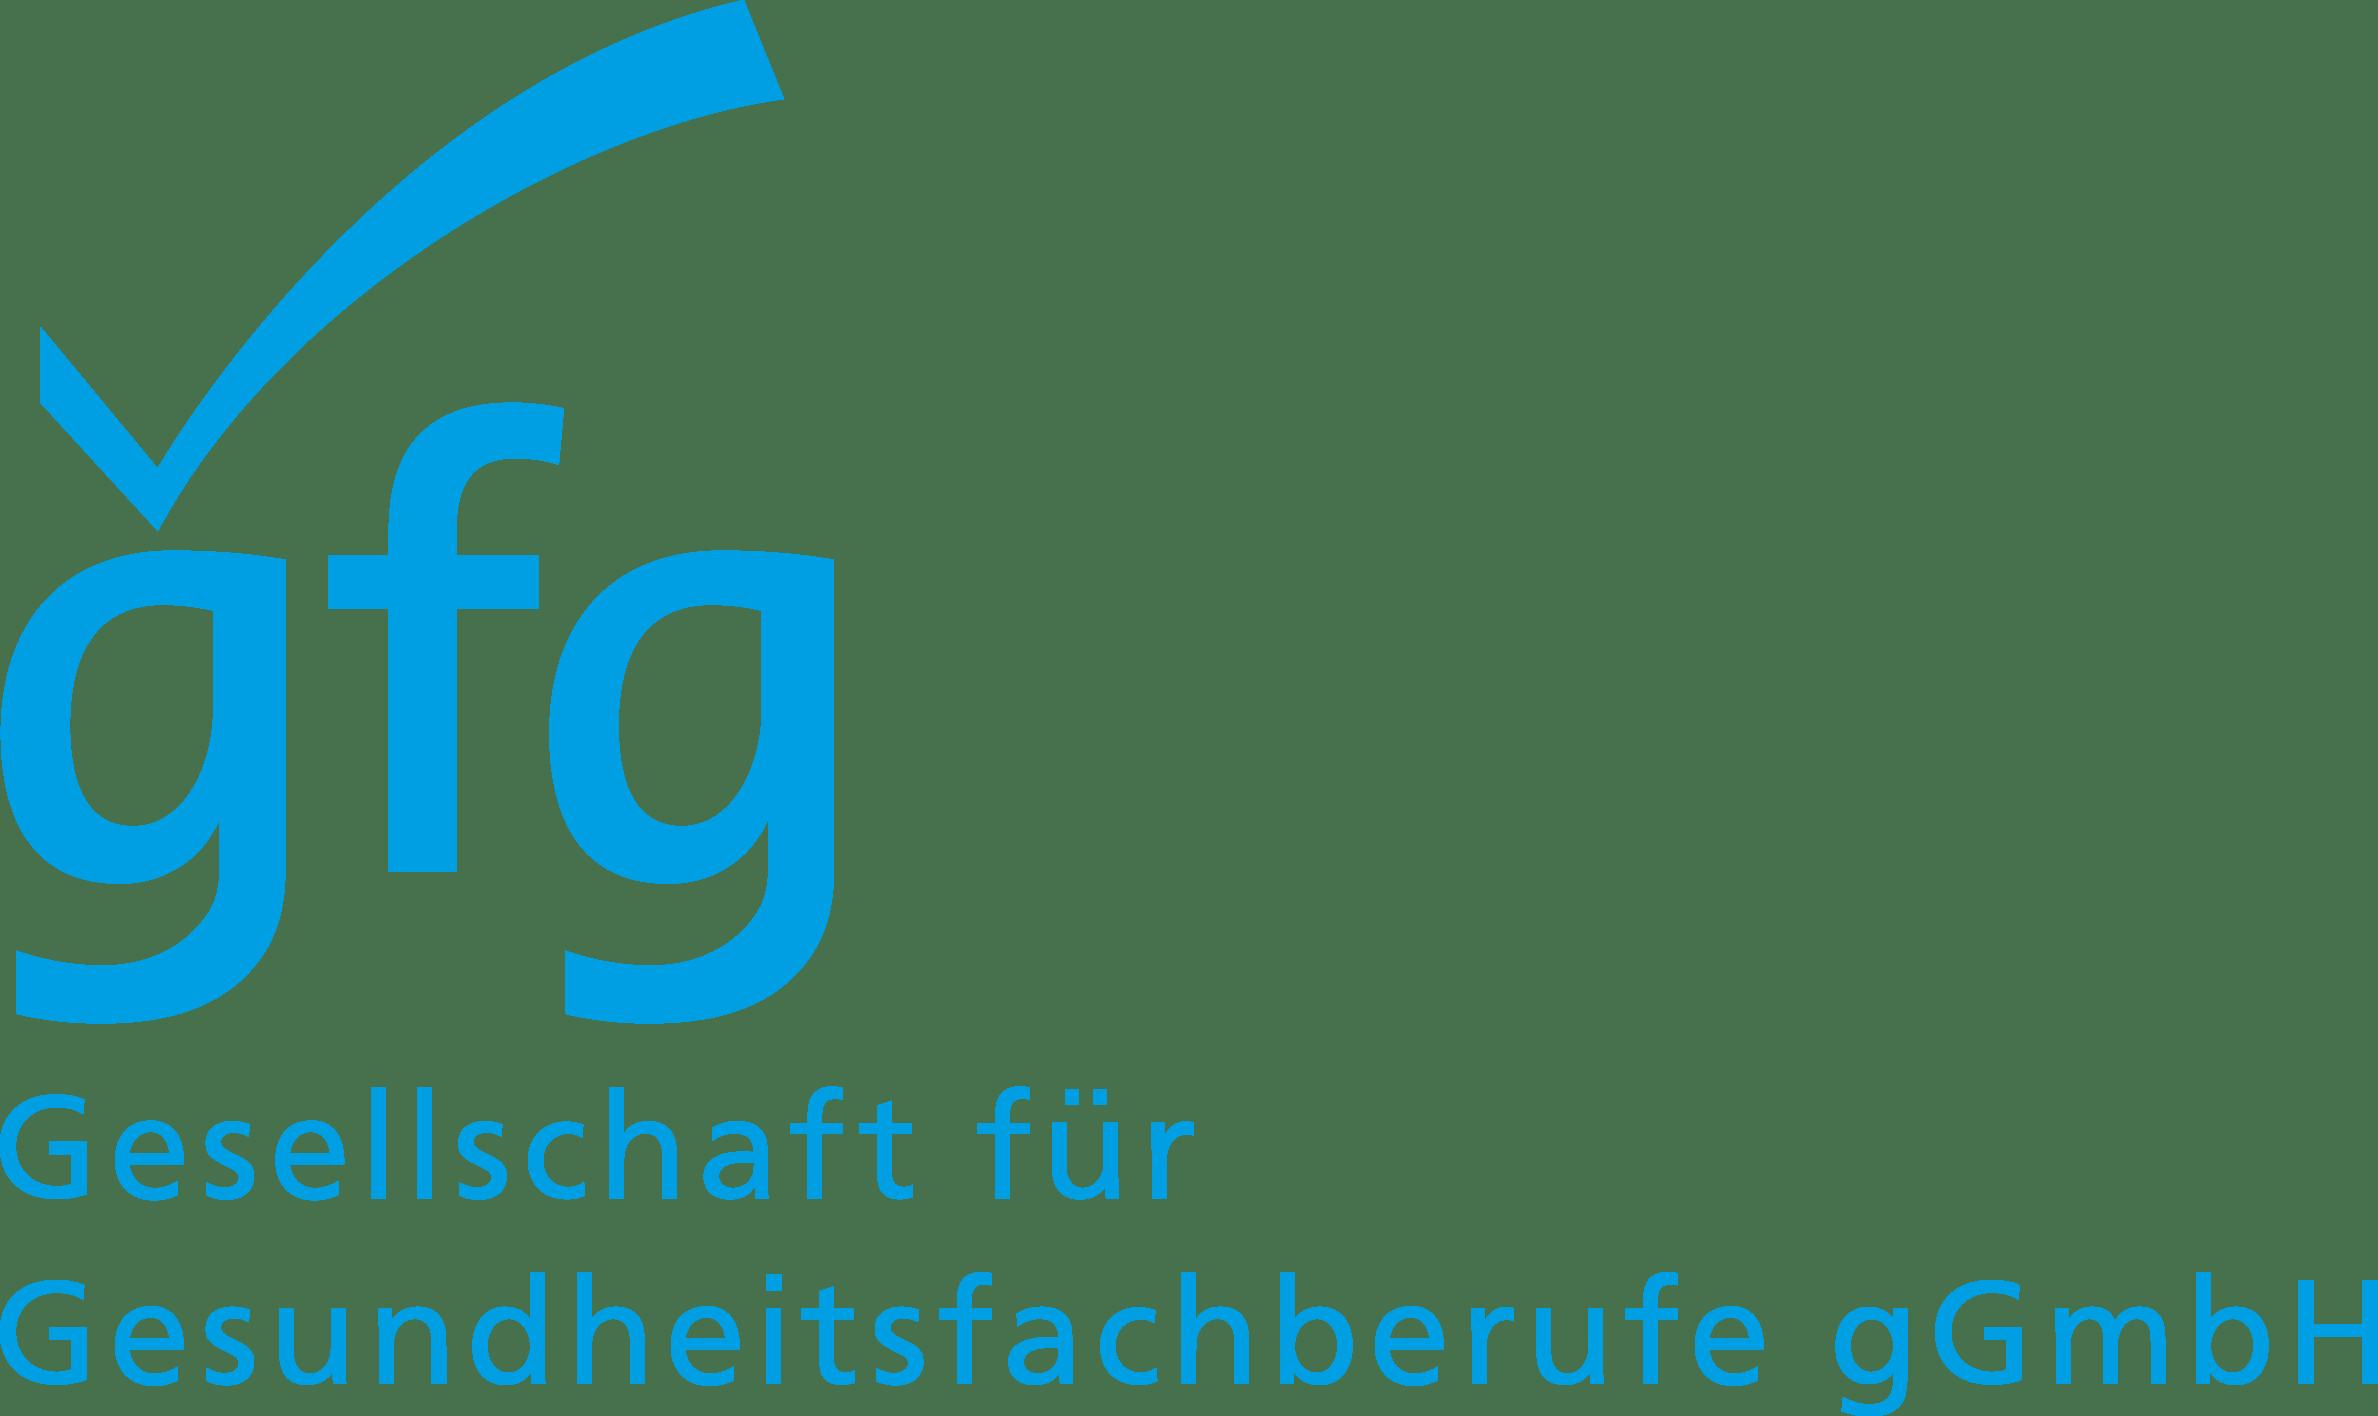 https://www.betreuung-und-pflege.de/app/files/2021/09/gfg-rostock_logo_hoch.png